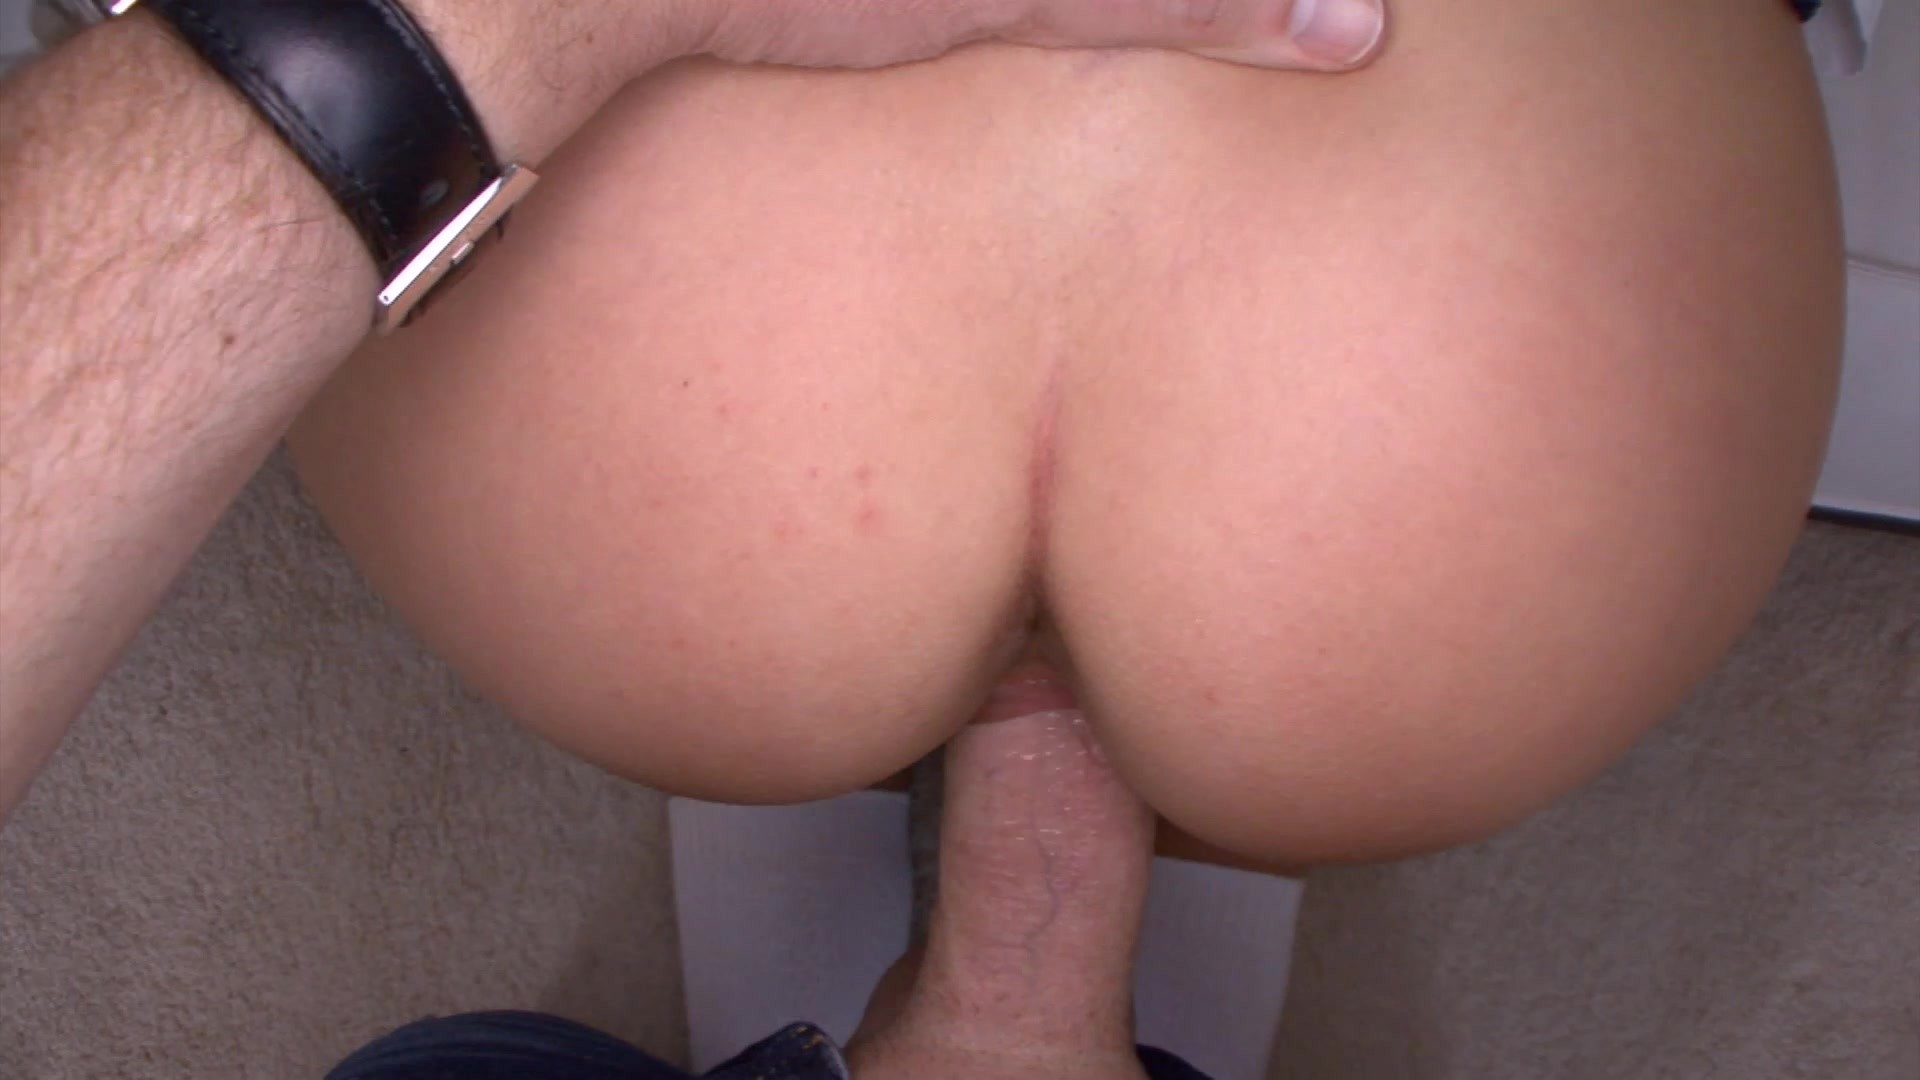 https://caps1cdn.adultempire.com/o/2437/3840/1711749_01510_3840c.jpg